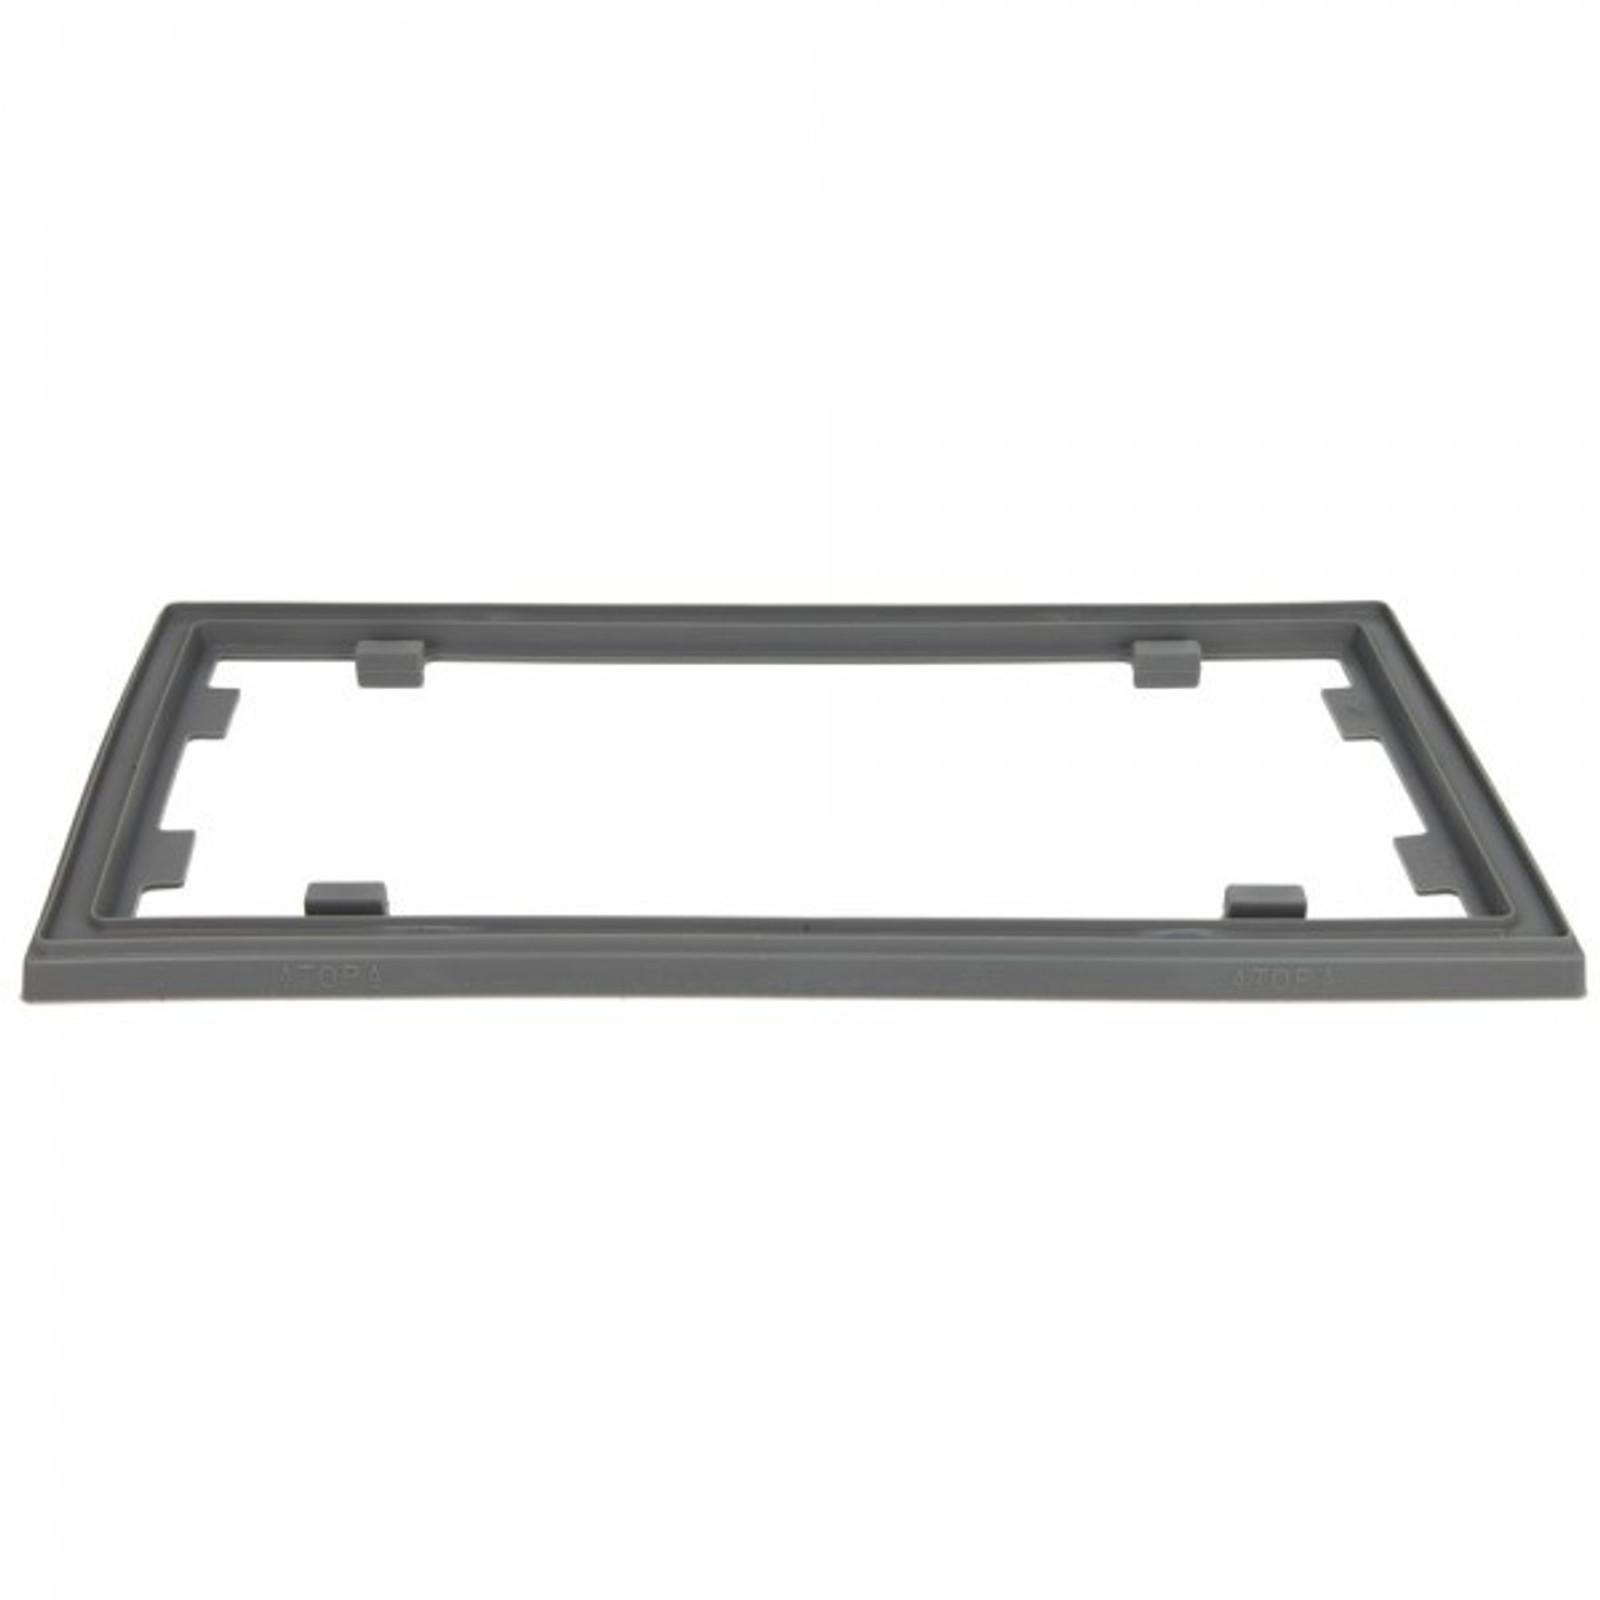 buderus sieger dichtung brenner gb112 gb142 15 30 kw bk11. Black Bedroom Furniture Sets. Home Design Ideas